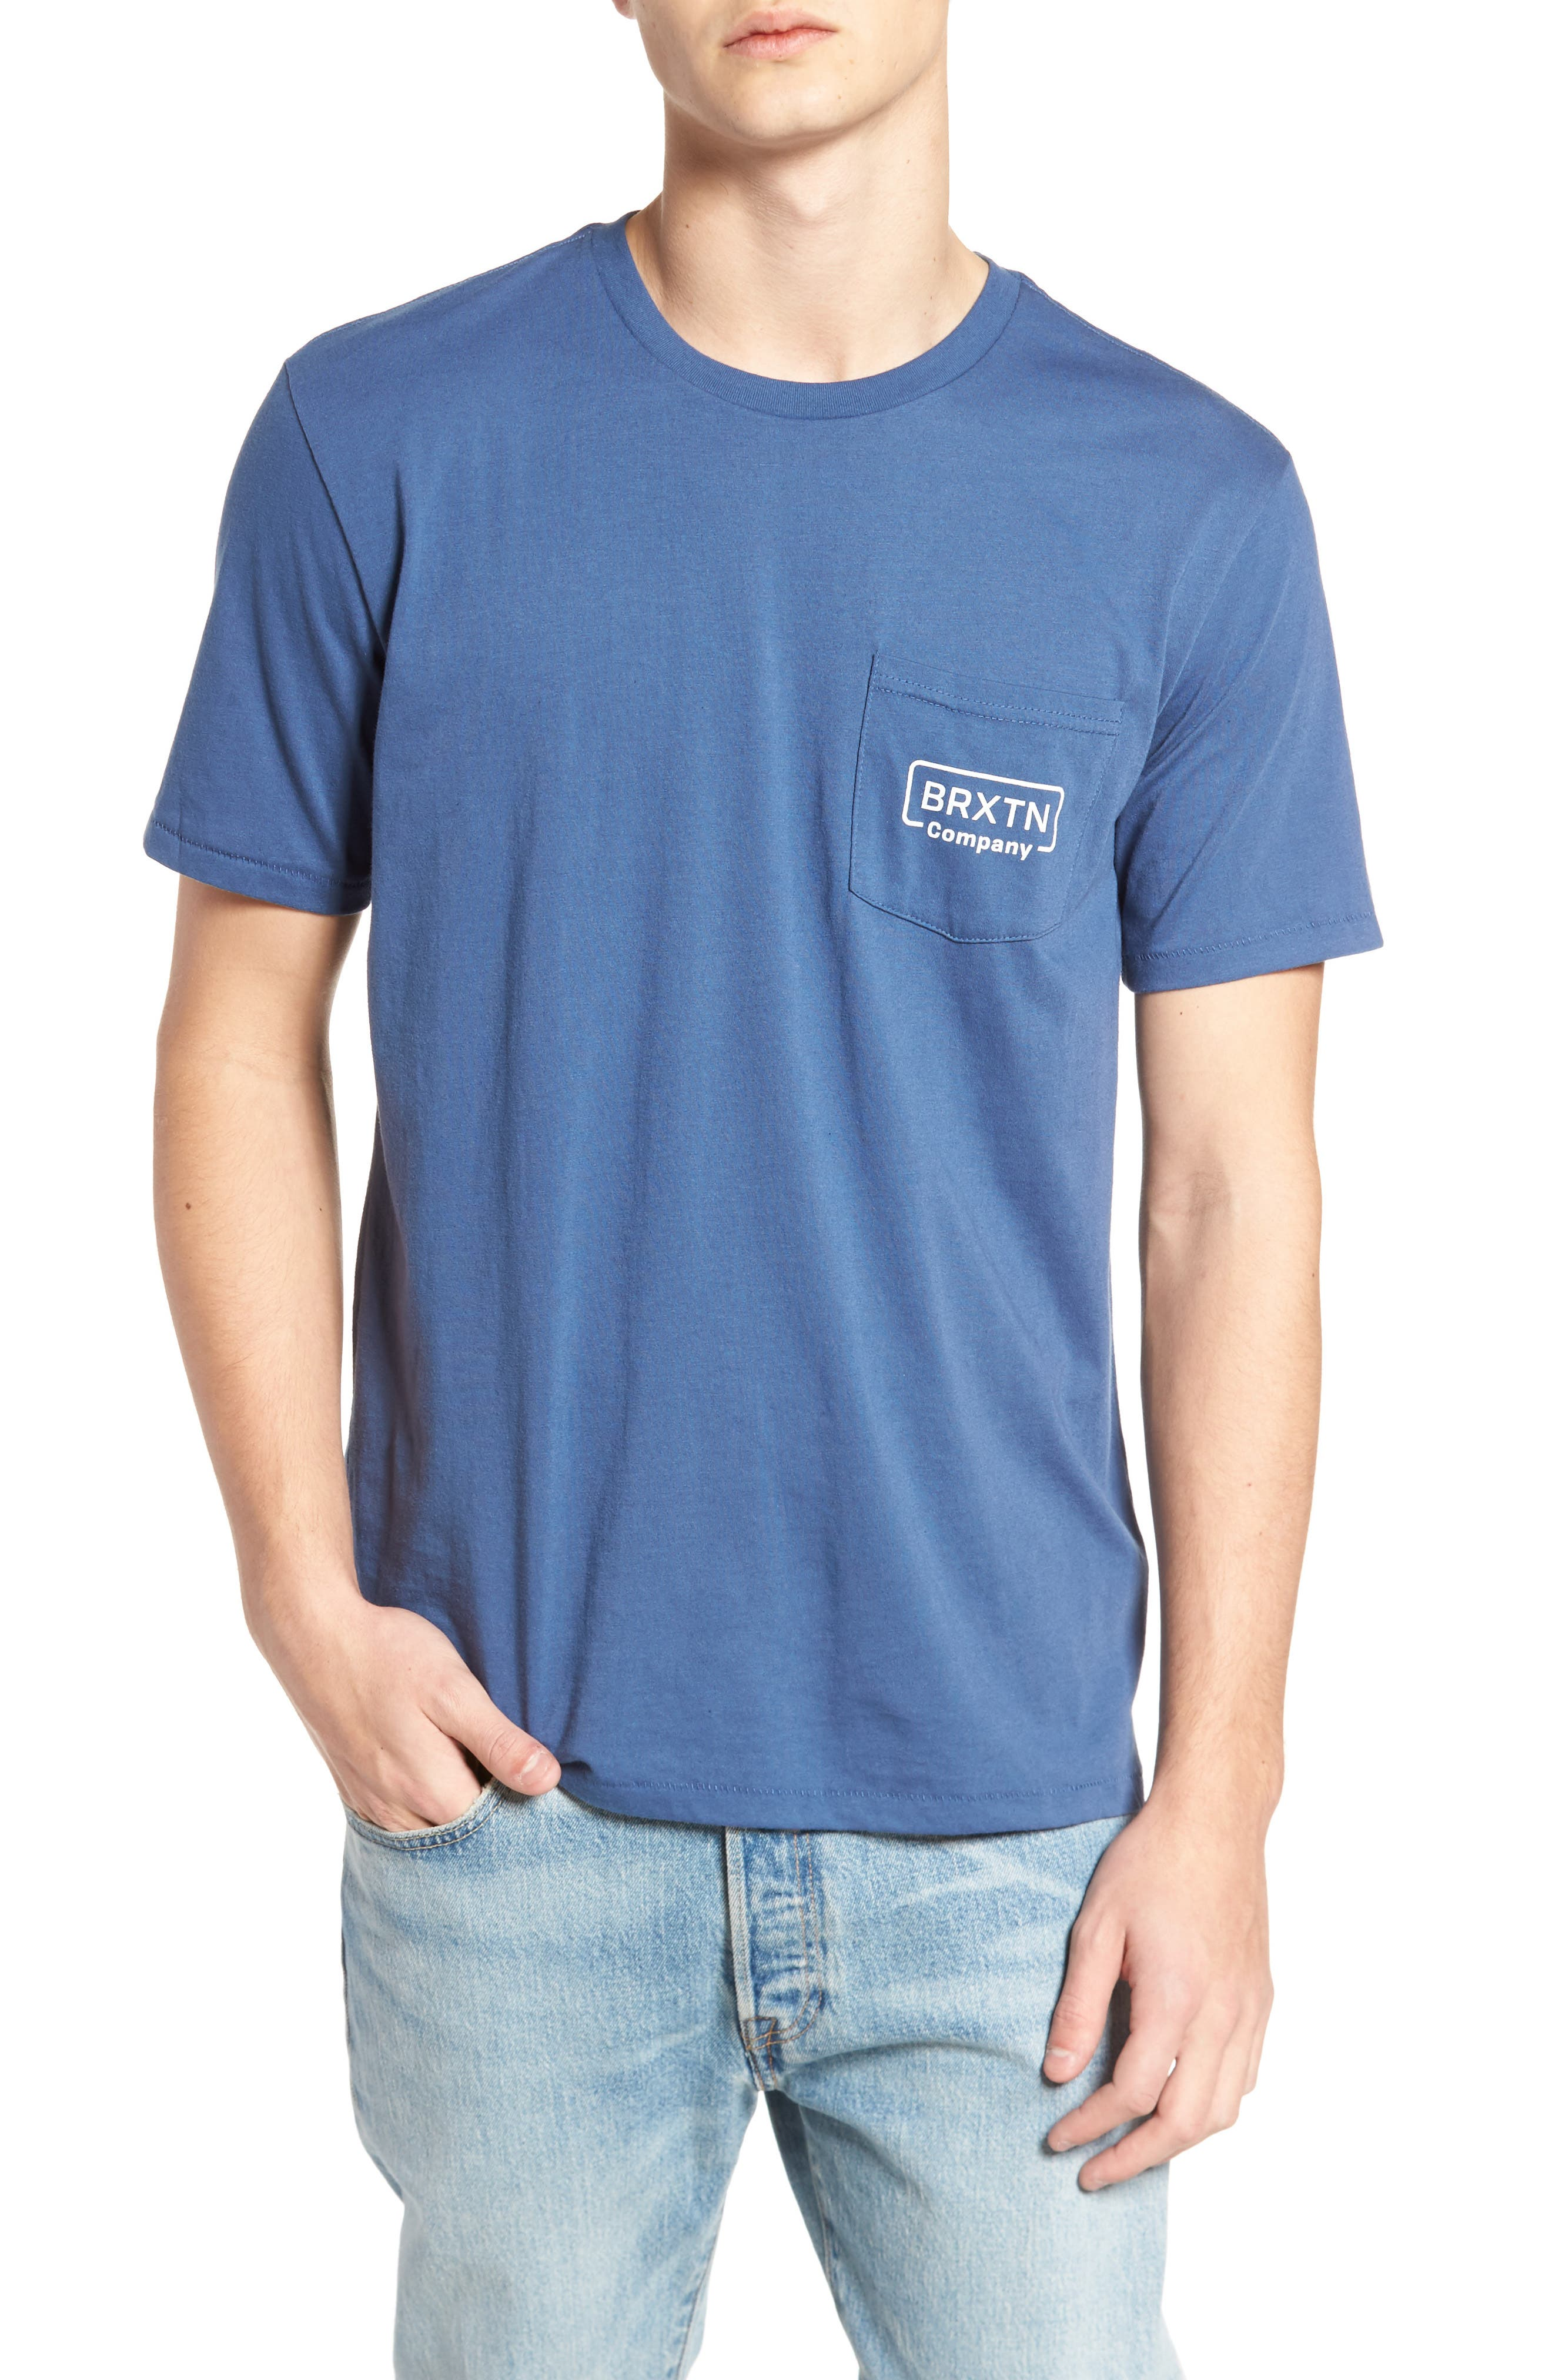 Brixton Crosswhite Pocket T-Shirt